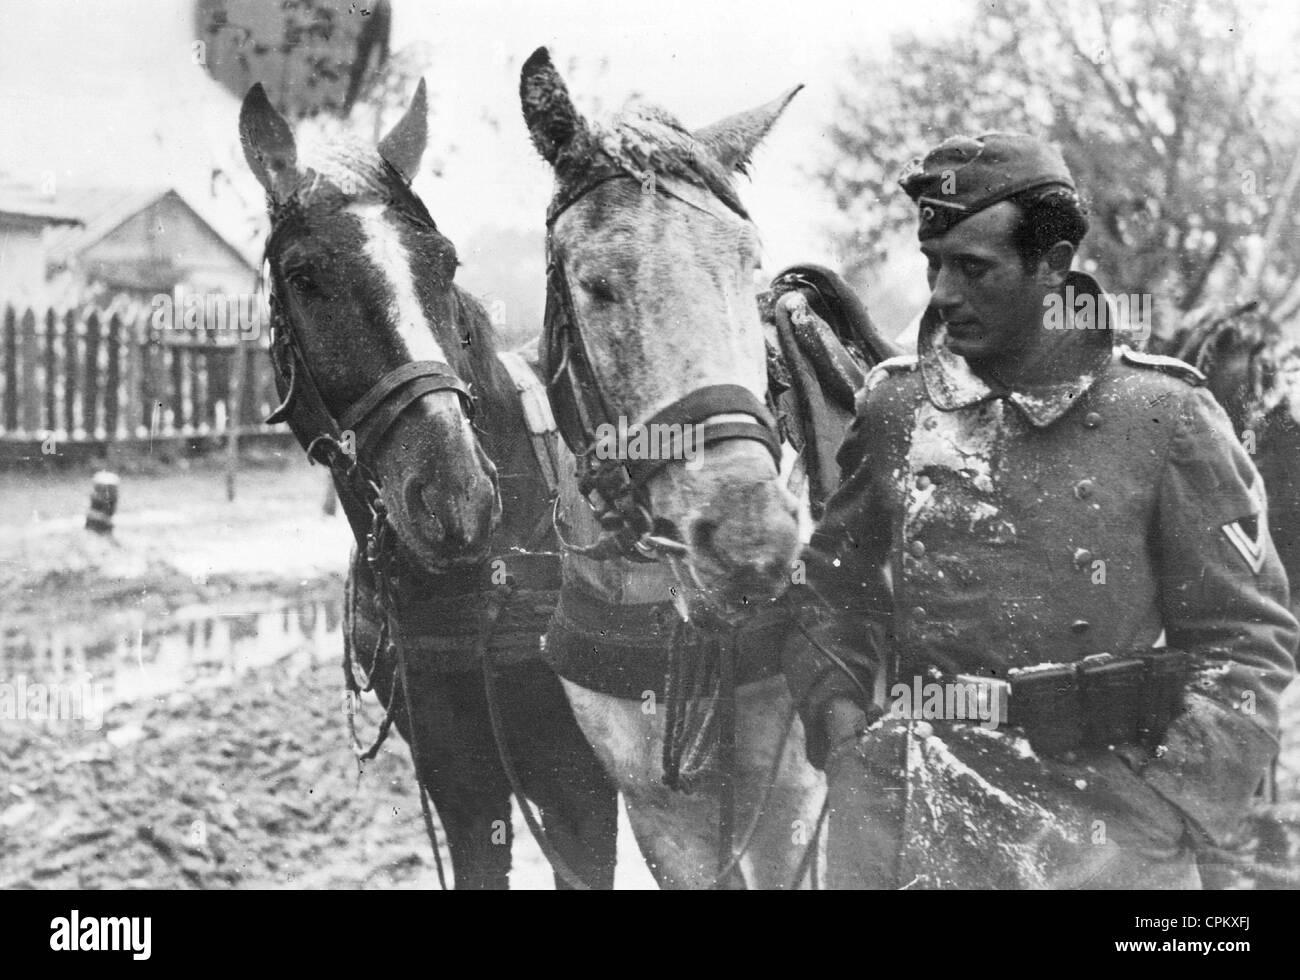 German Coachman Standing Next to his Horses, 1941 - Stock Image